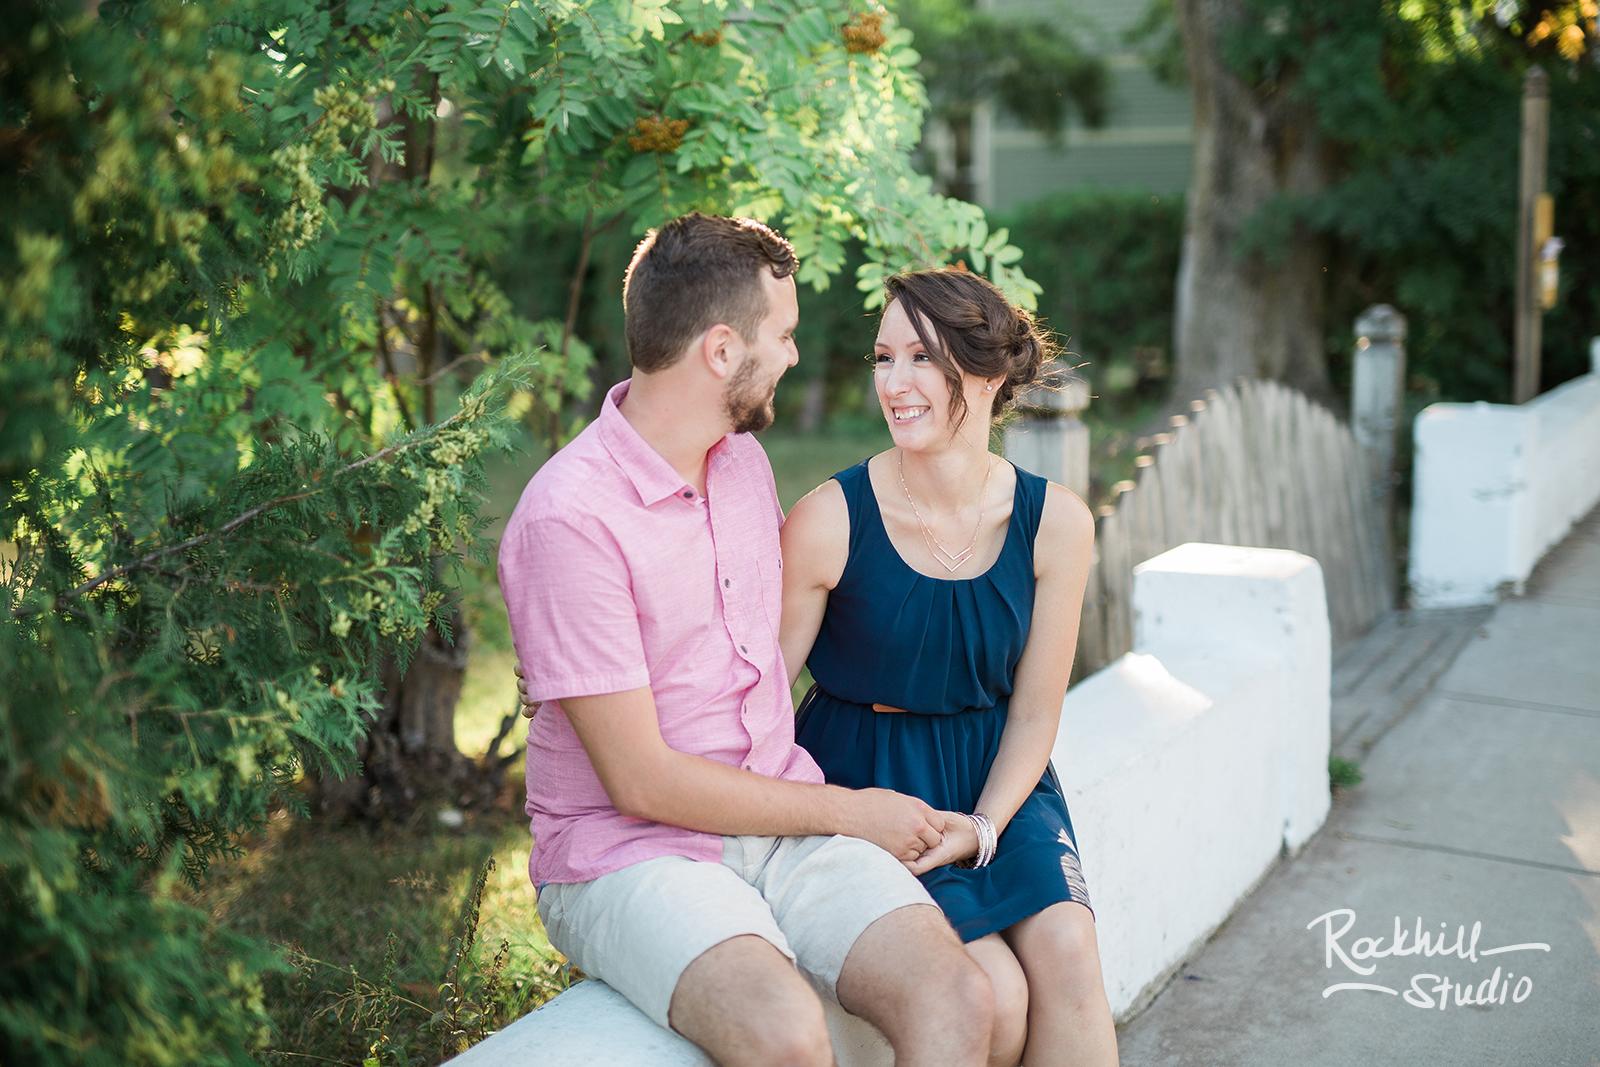 mackinac-island-wedding-engagement-northern-michigan-rockhill-studio-jt-25.jpg